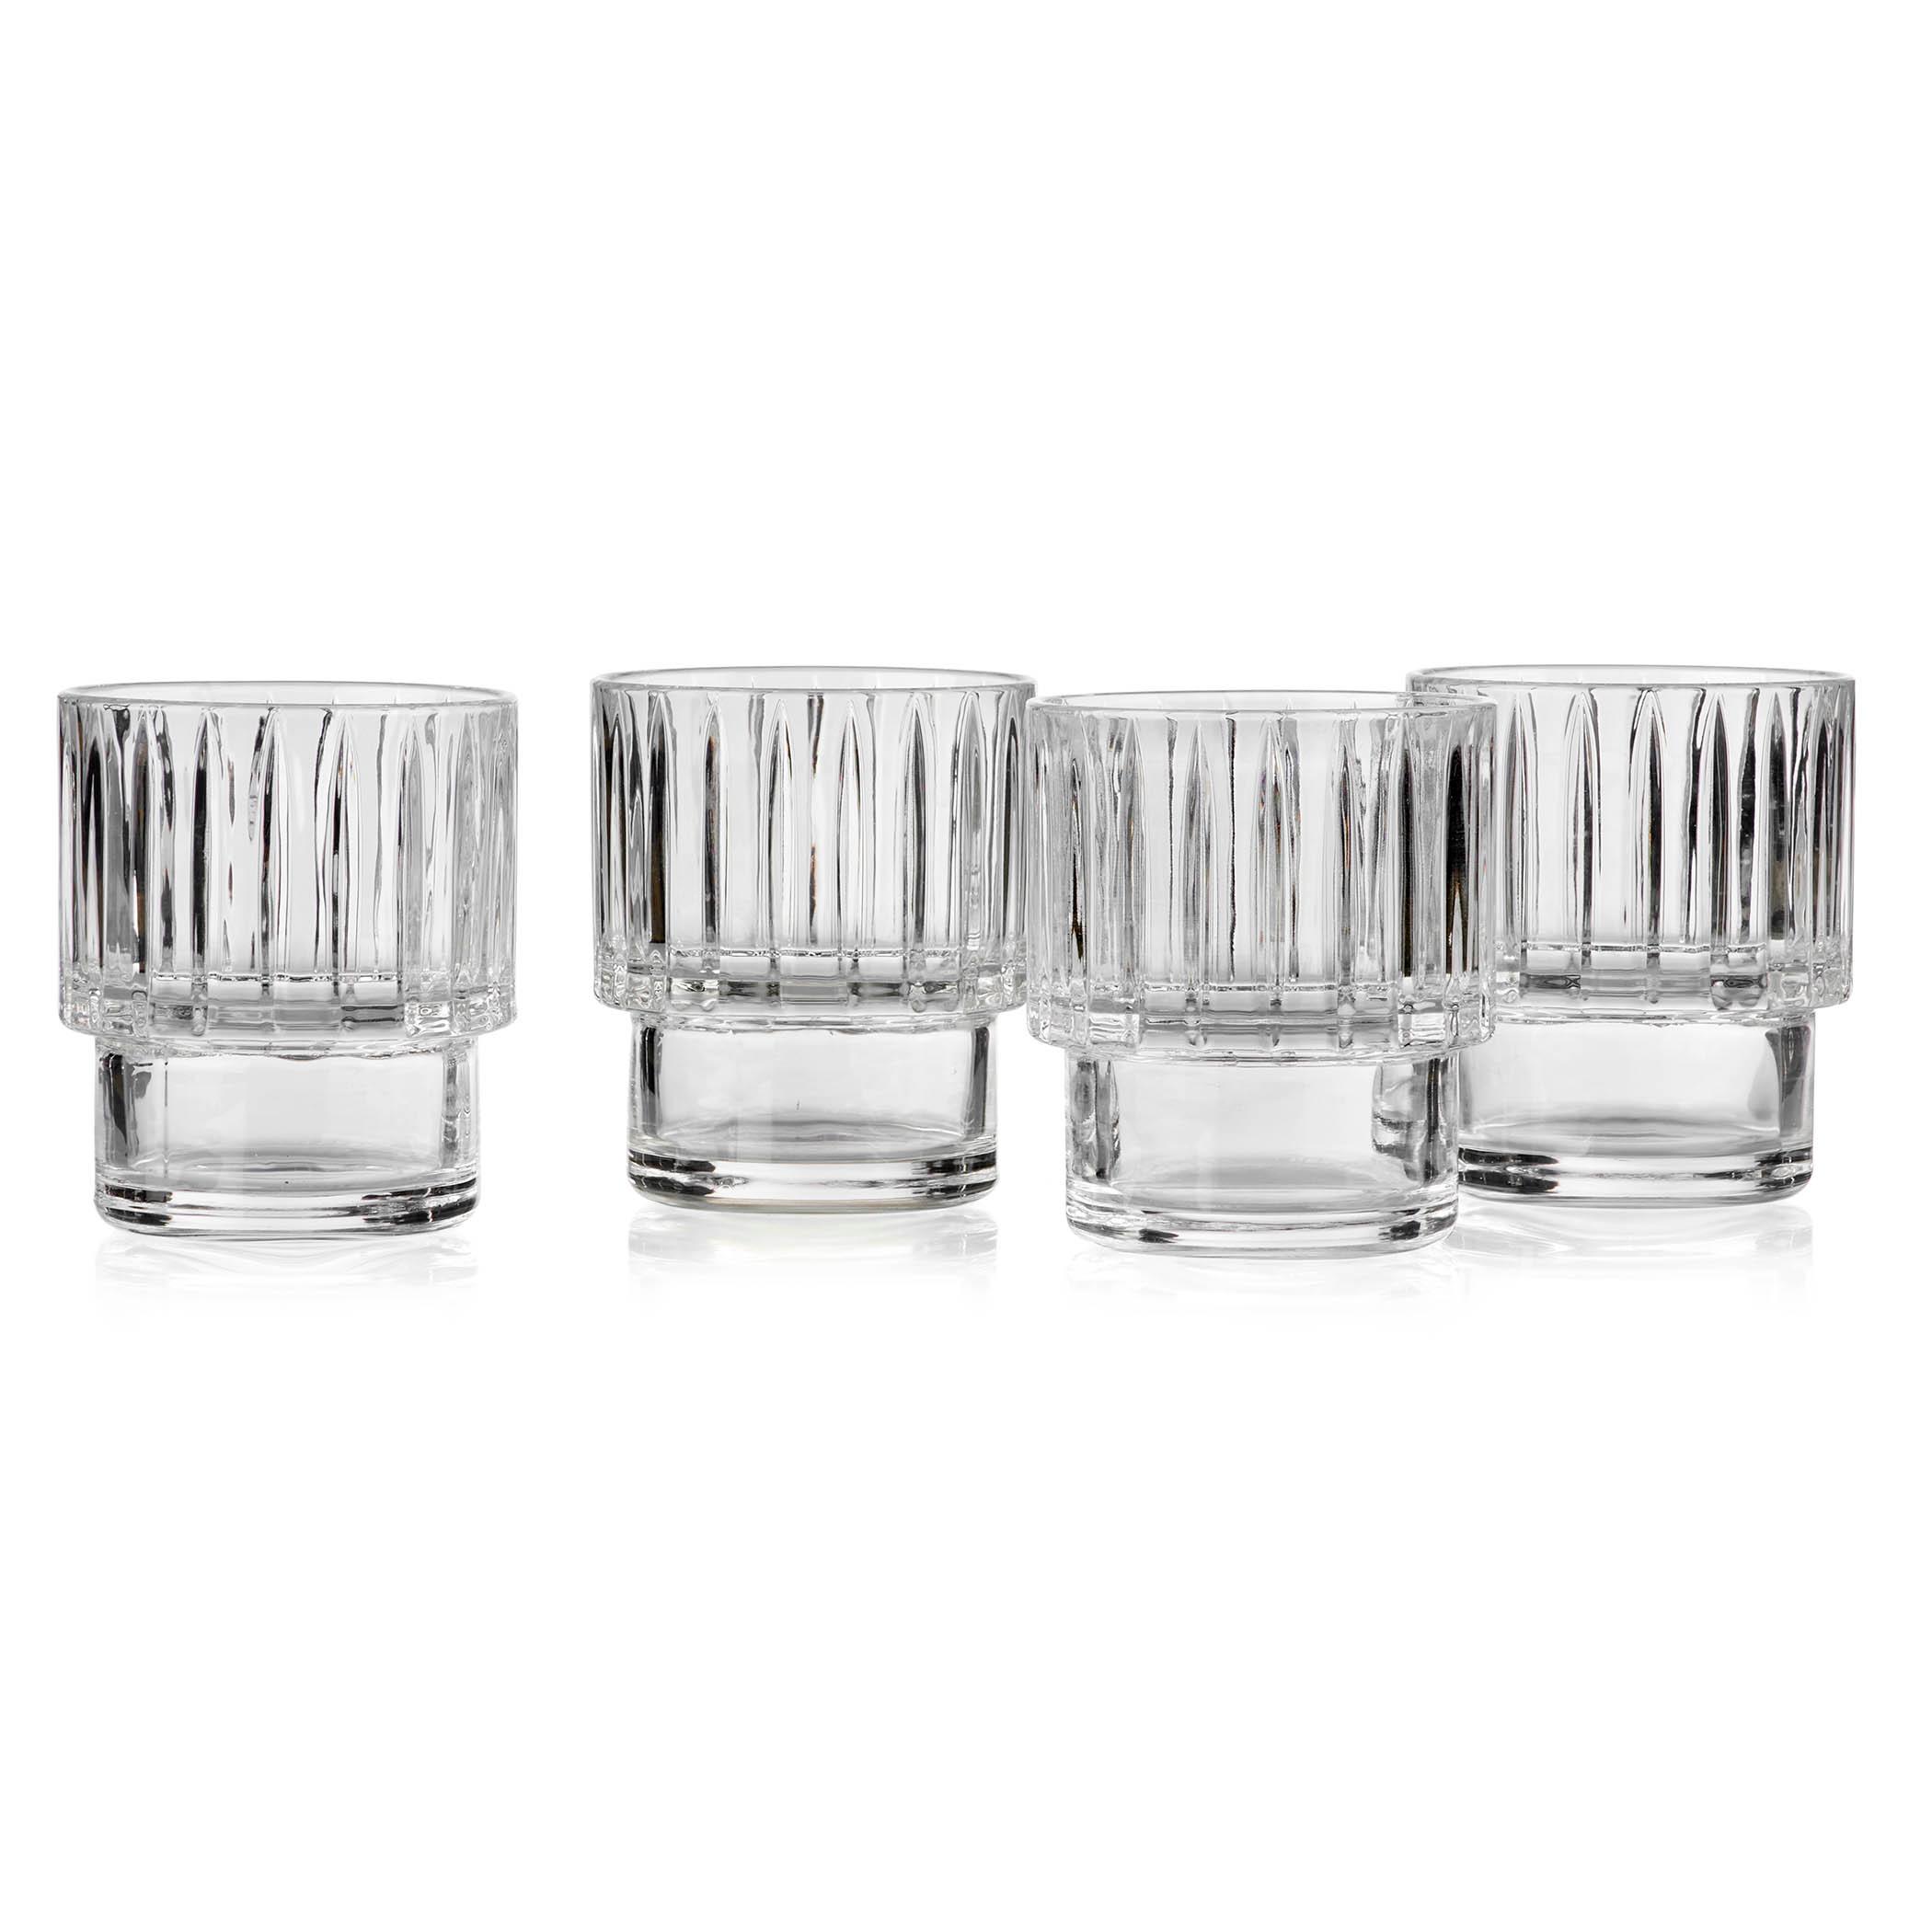 Fitz Barware - Sets of 4